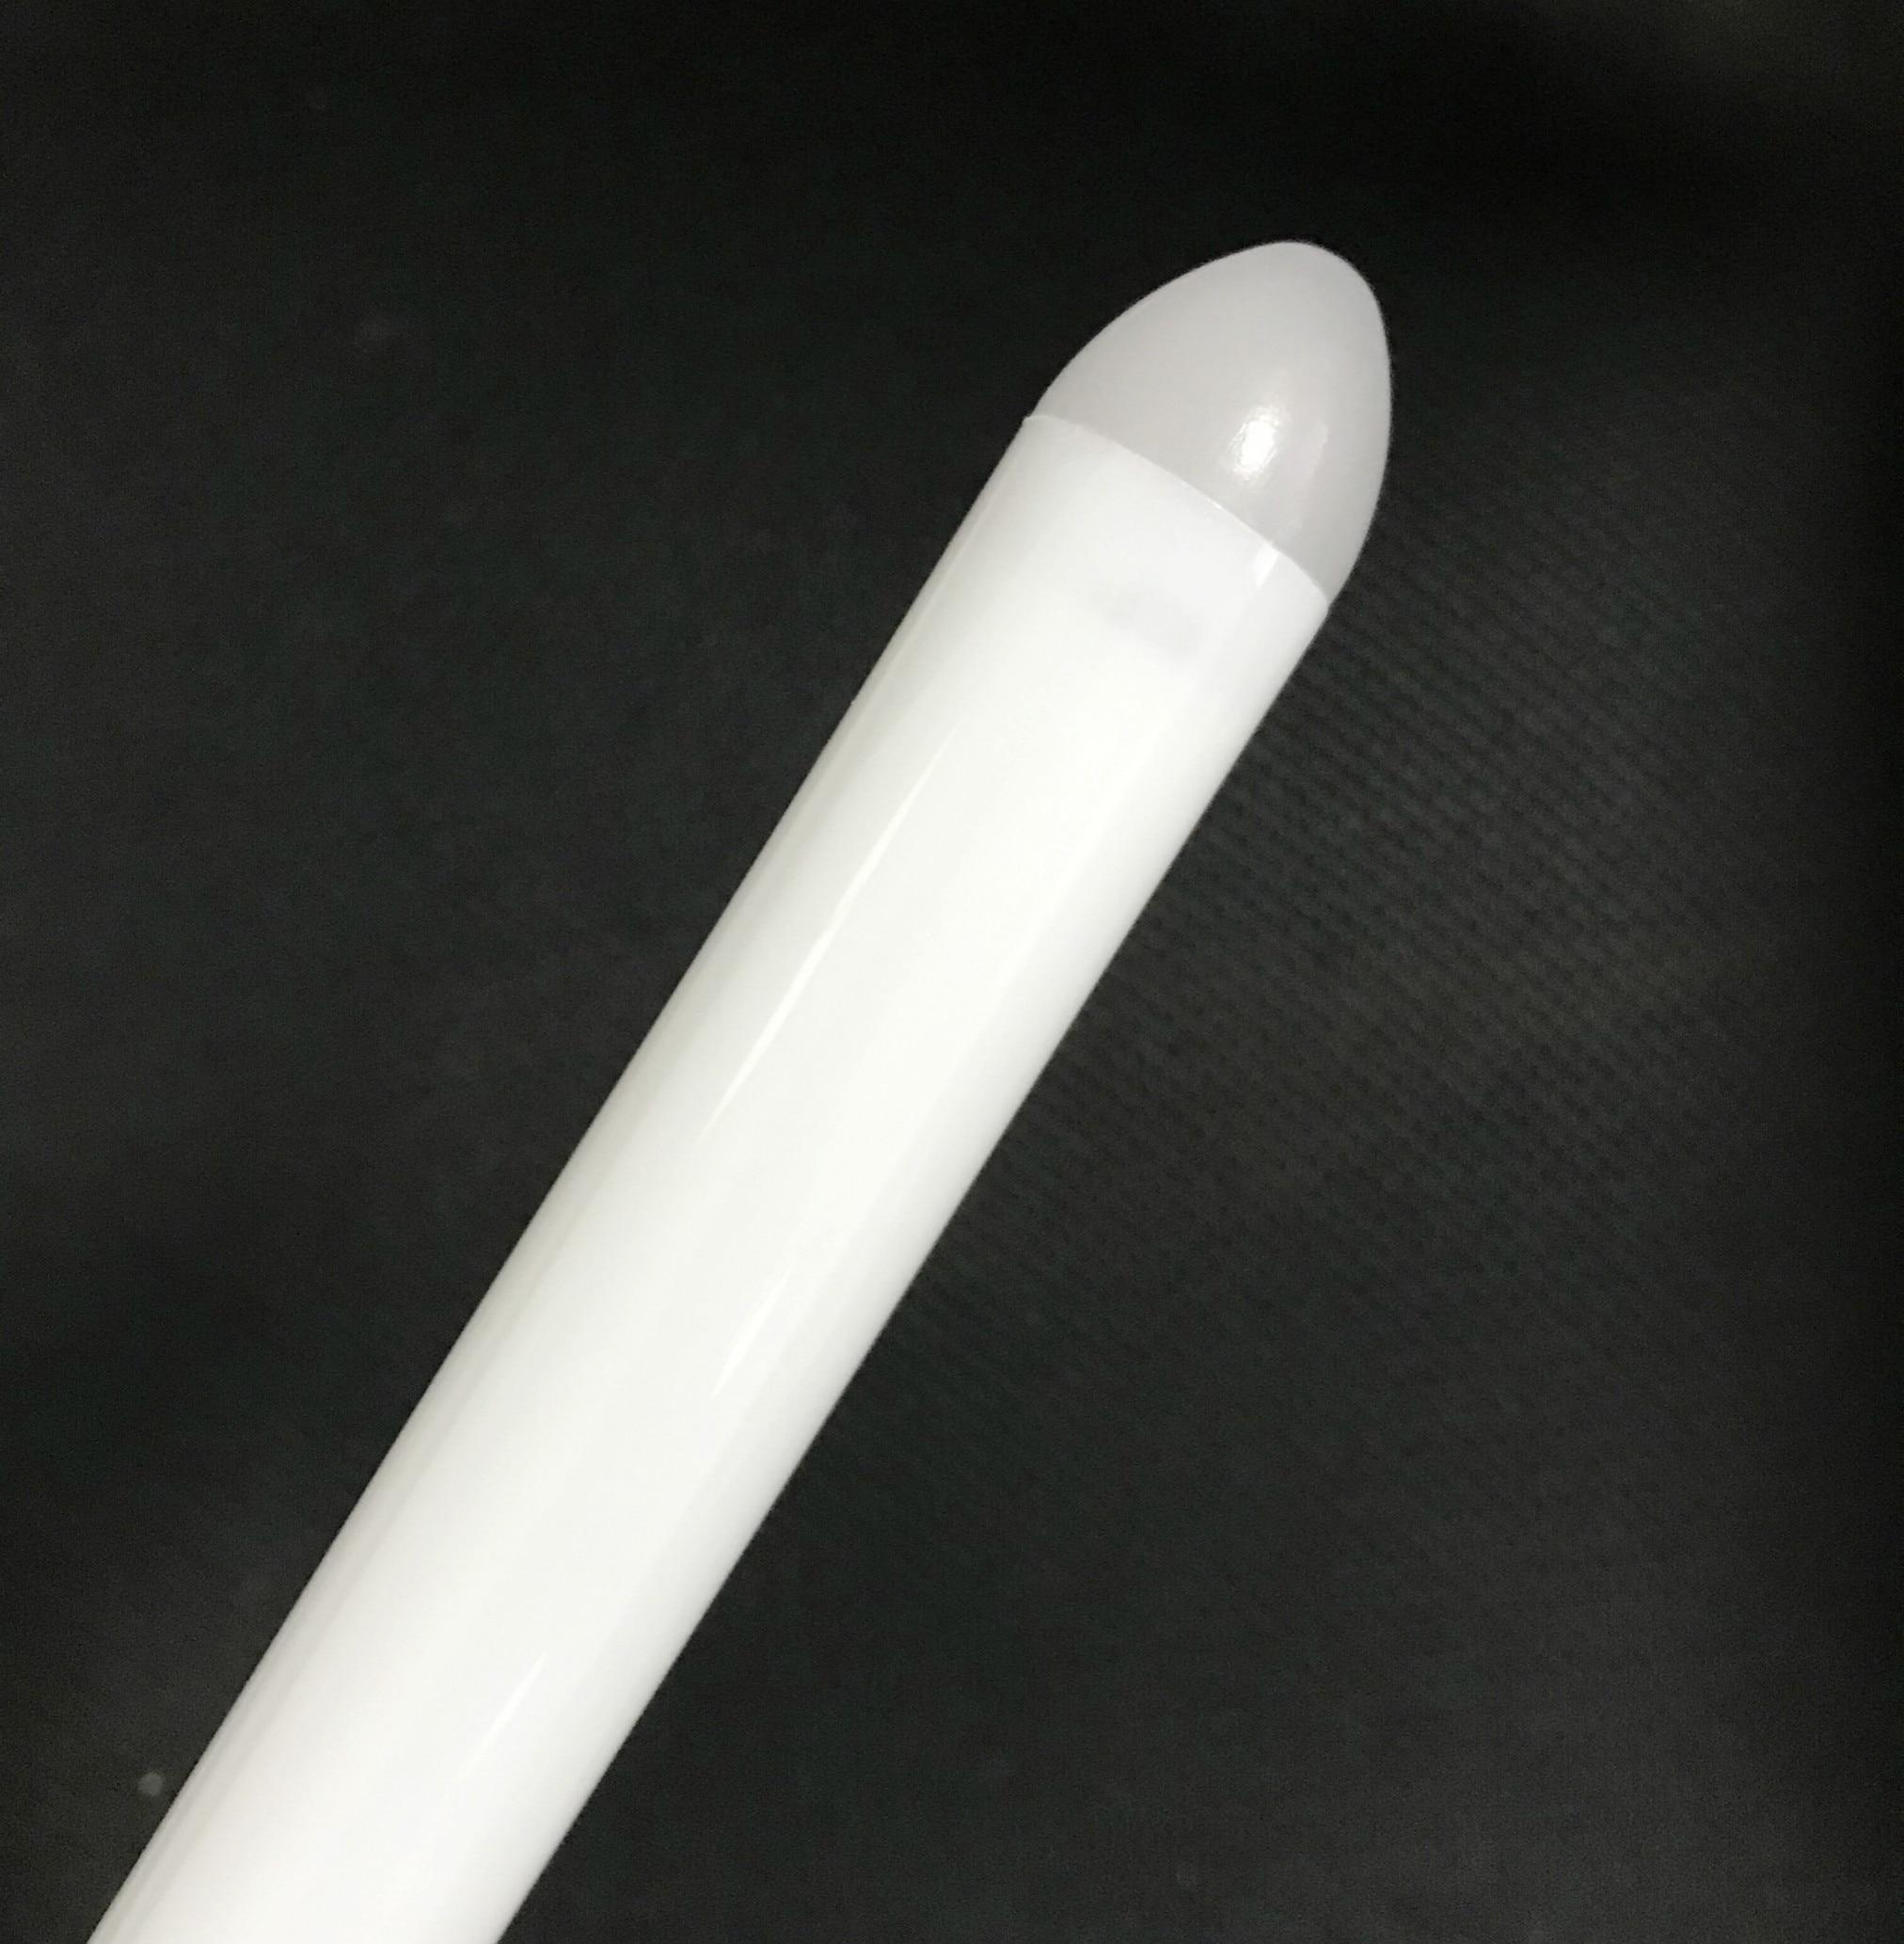 Lightsaber Blade Fit For Lightsaber Length 78/92cm High Quality PC 2019 New